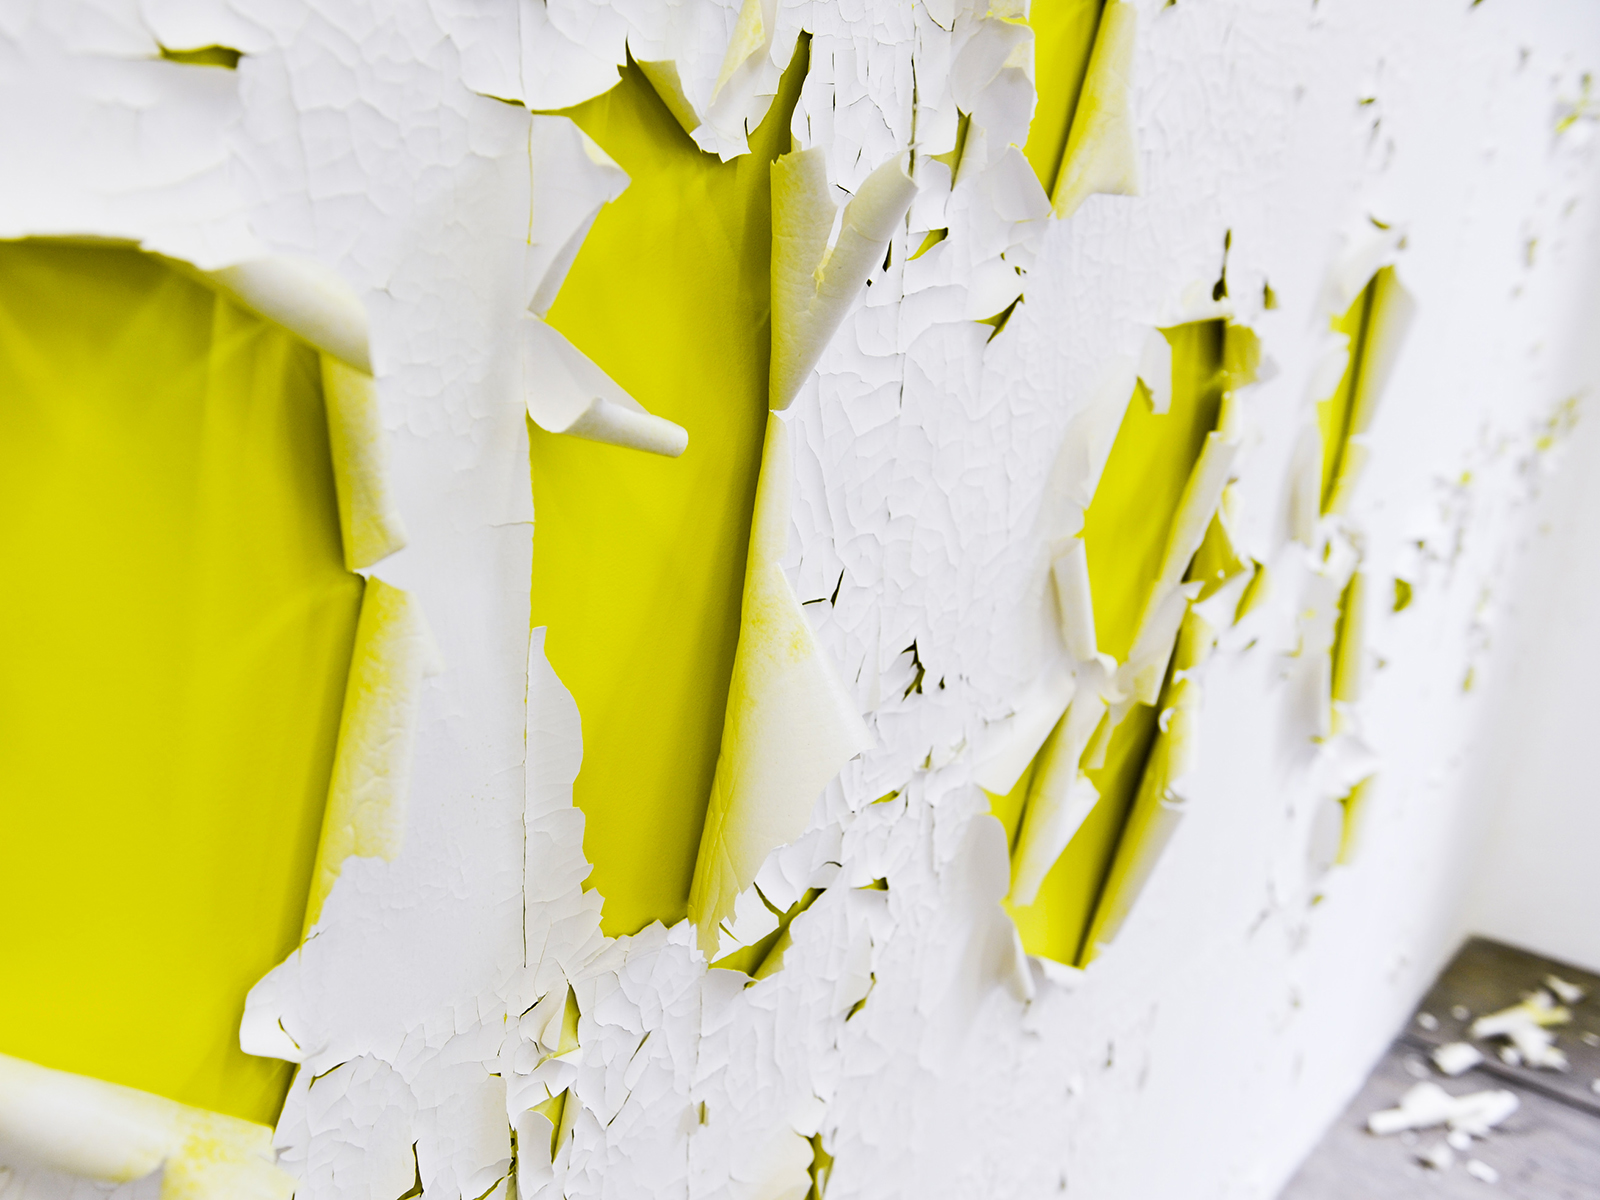 Benoit-Delaunay-artiste-installations-Un Sentiment de Chaleur-10